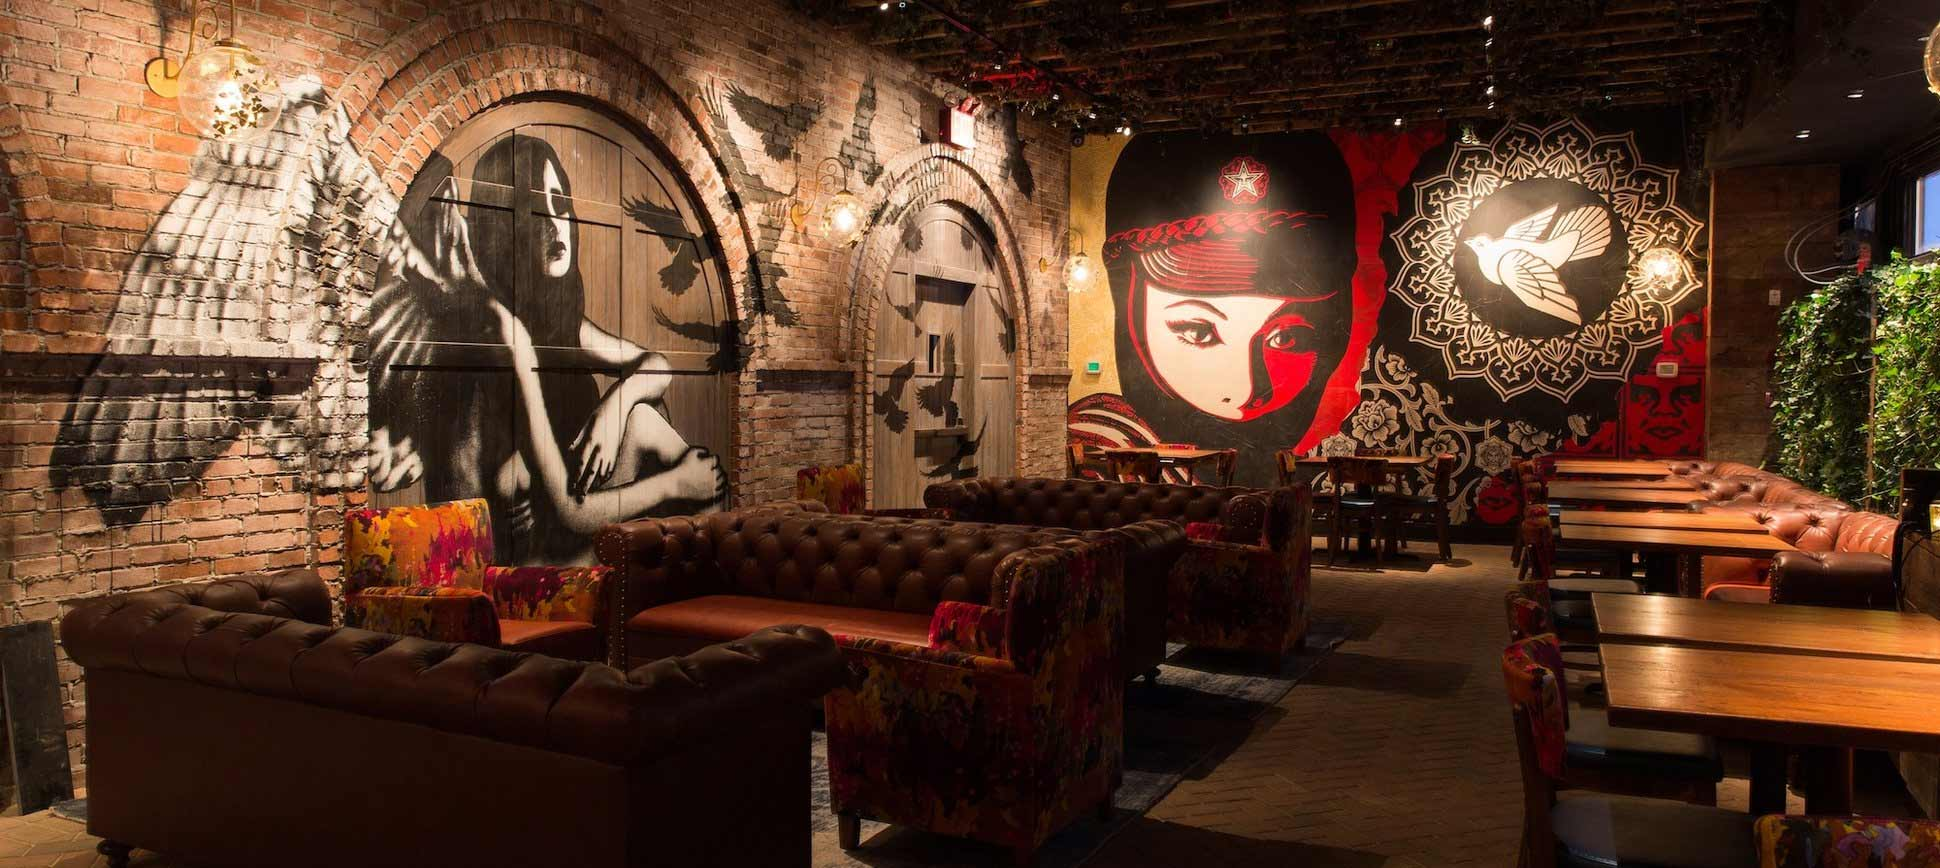 Cafe De Paris Club Gallery